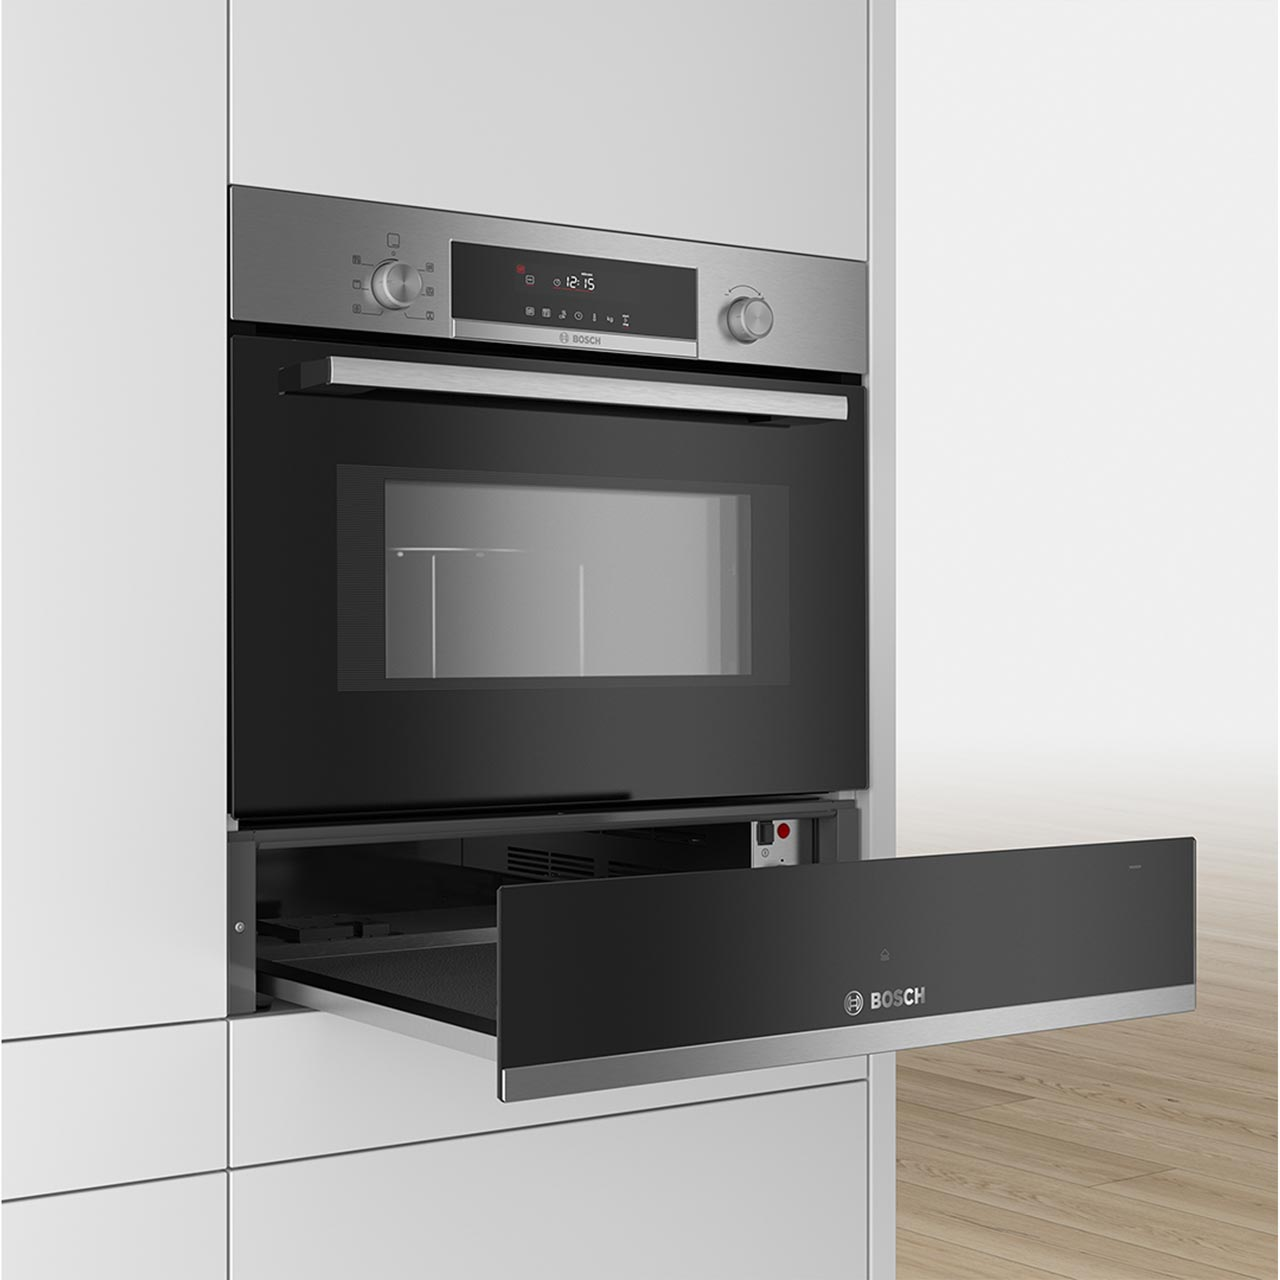 Bic510ns0b Bosch Warming Drawer Ao